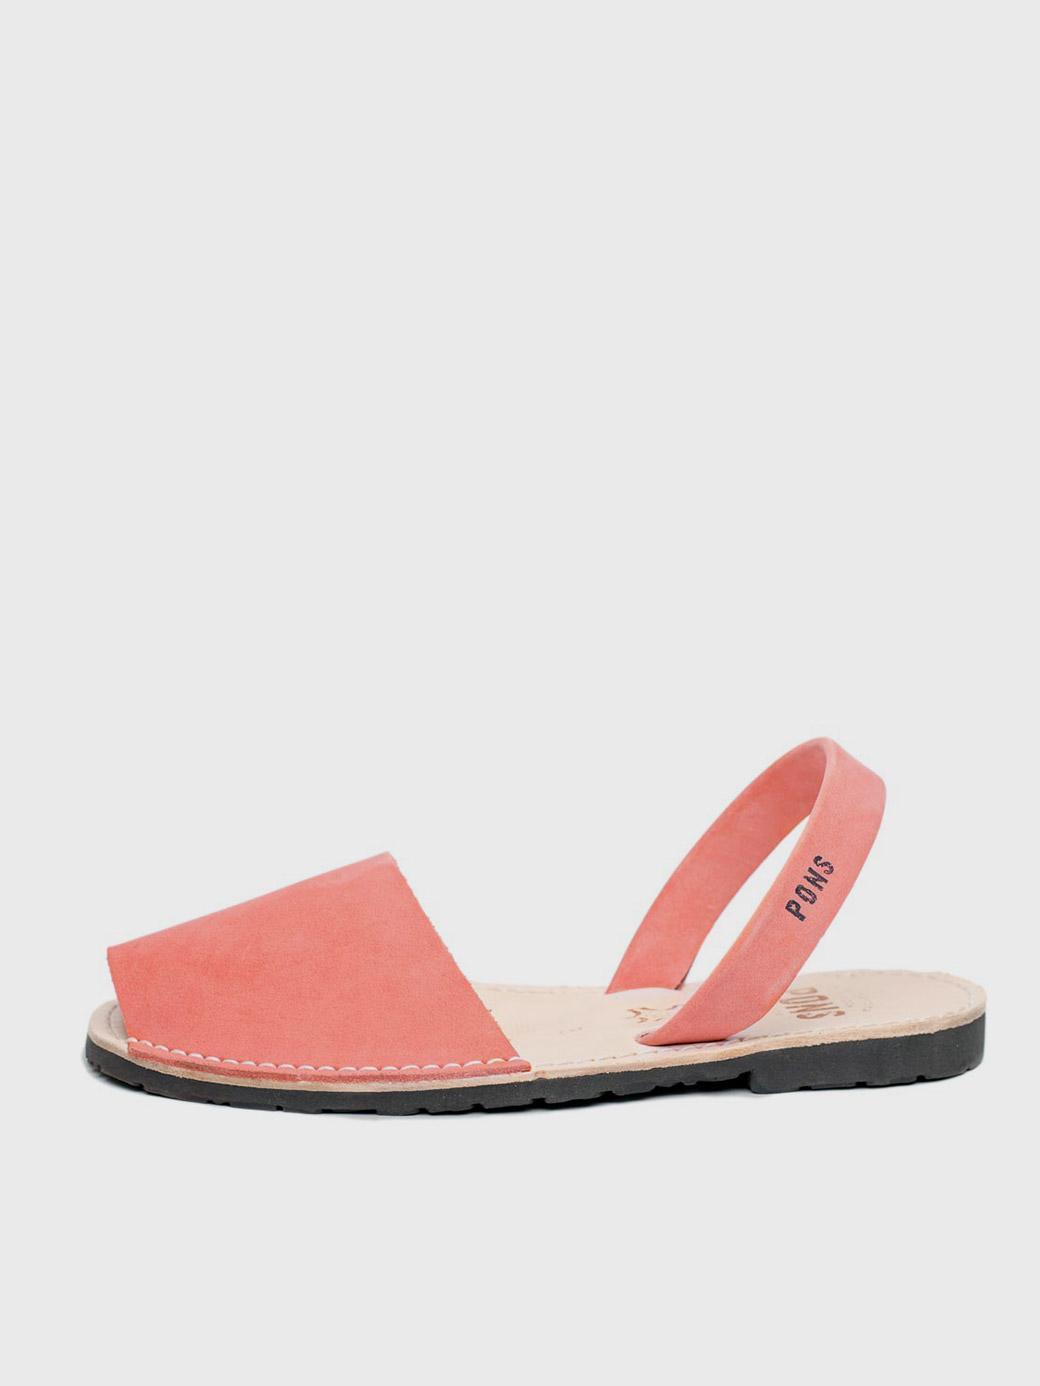 Pons Shoes Summer 2020 picks